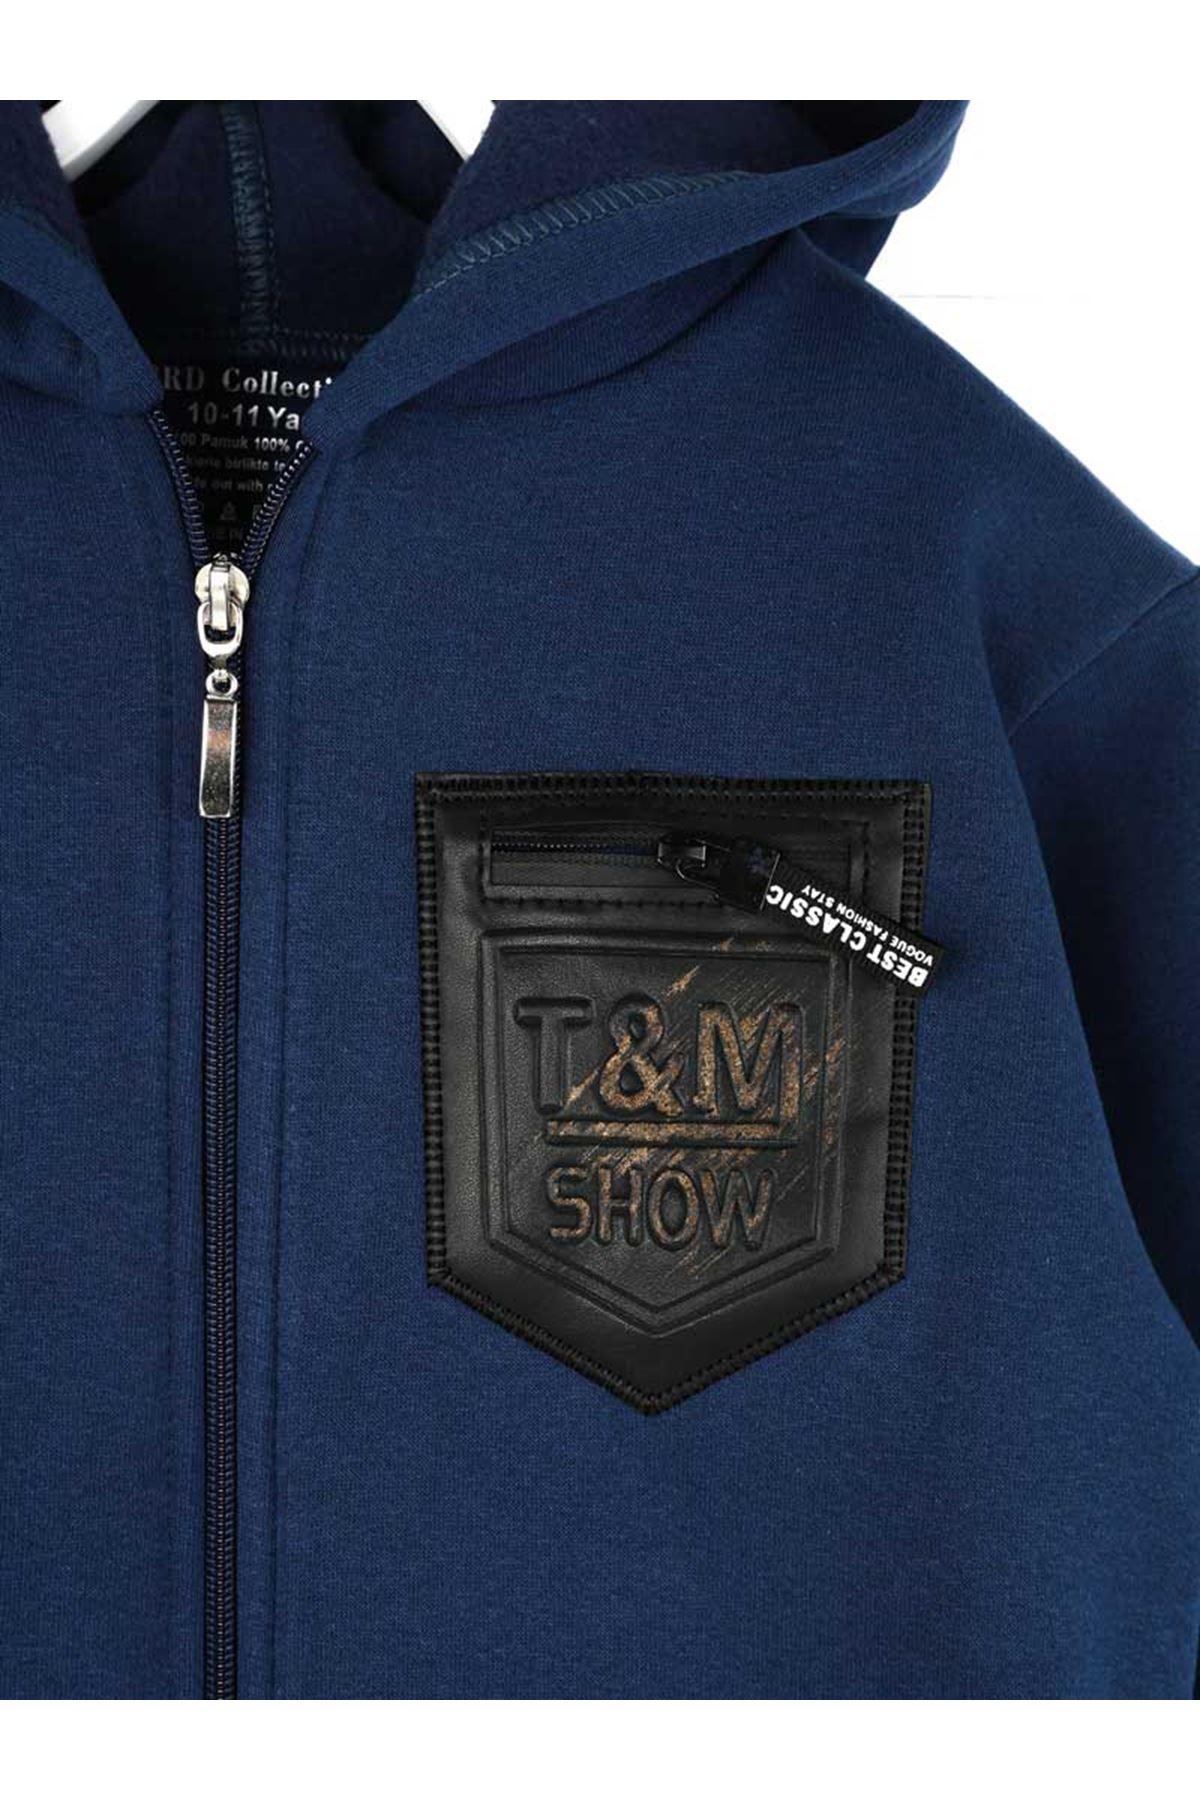 Indigo Winterisation Male Child Sweatshirt